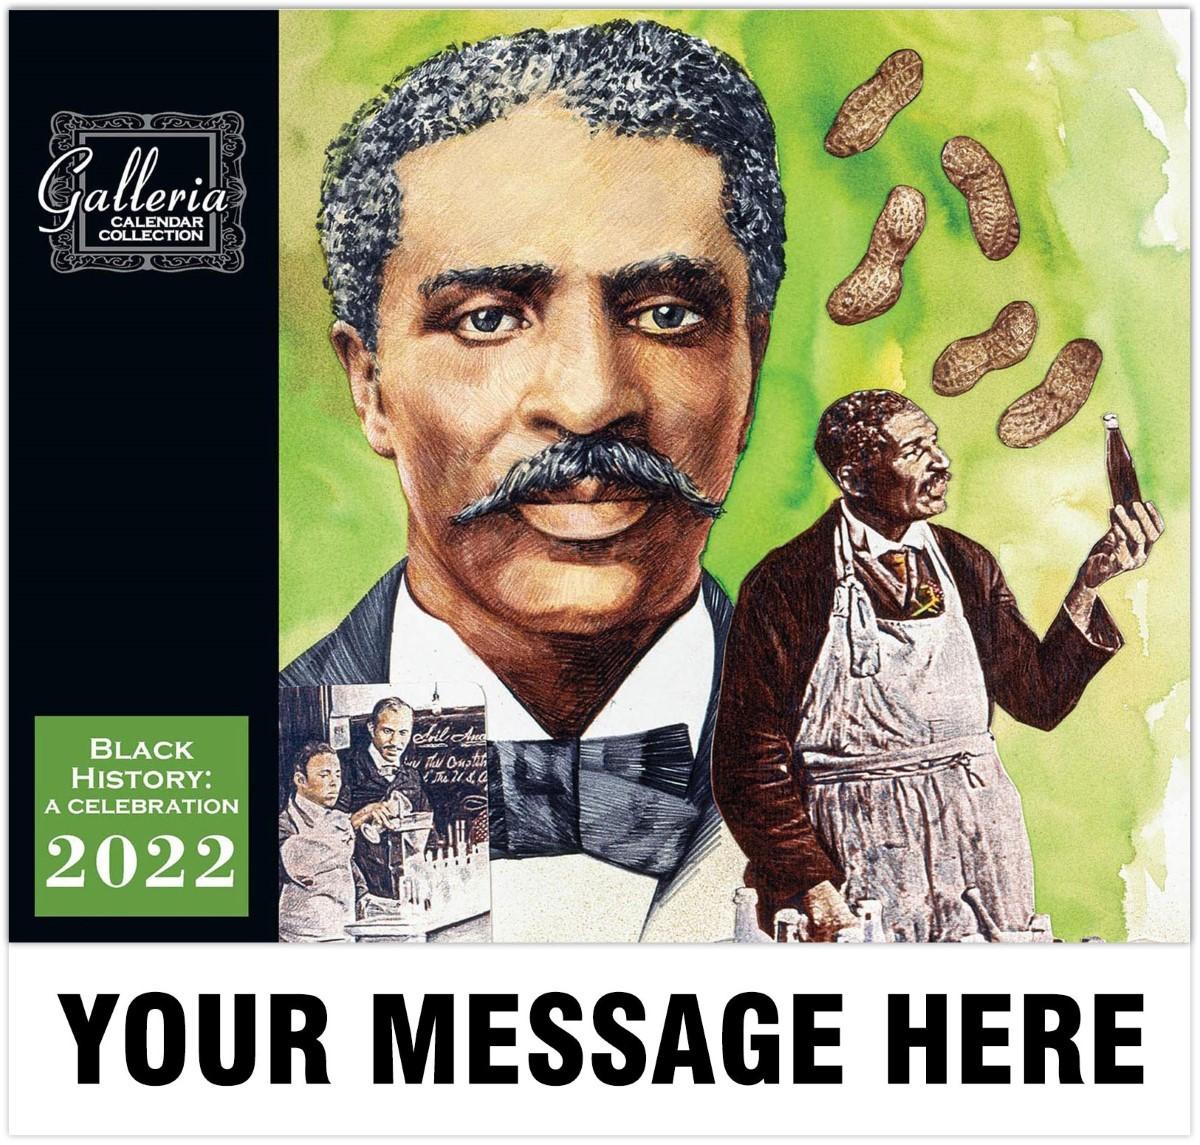 Black History Celebration Wall Calendar